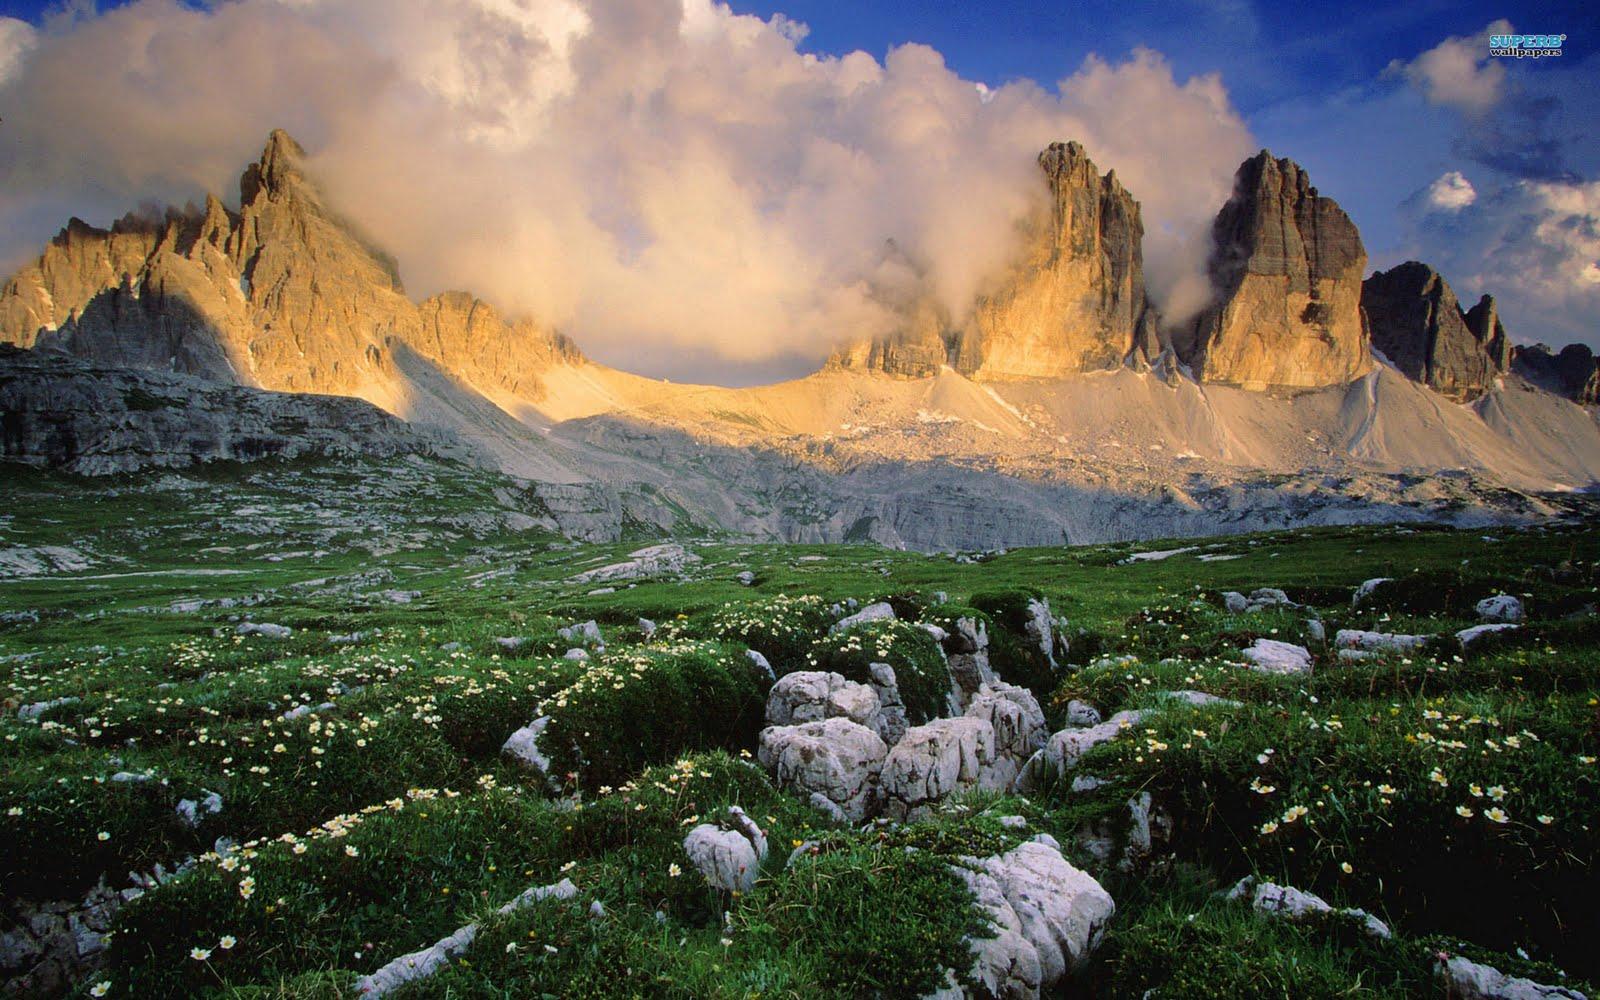 http://2.bp.blogspot.com/-A7r3rn7Rn5U/TcwSGjqxk1I/AAAAAAAANM4/-Mg41zox9pI/s1600/dolomite-mountains-in-italy-3322-1920x1200.jpg